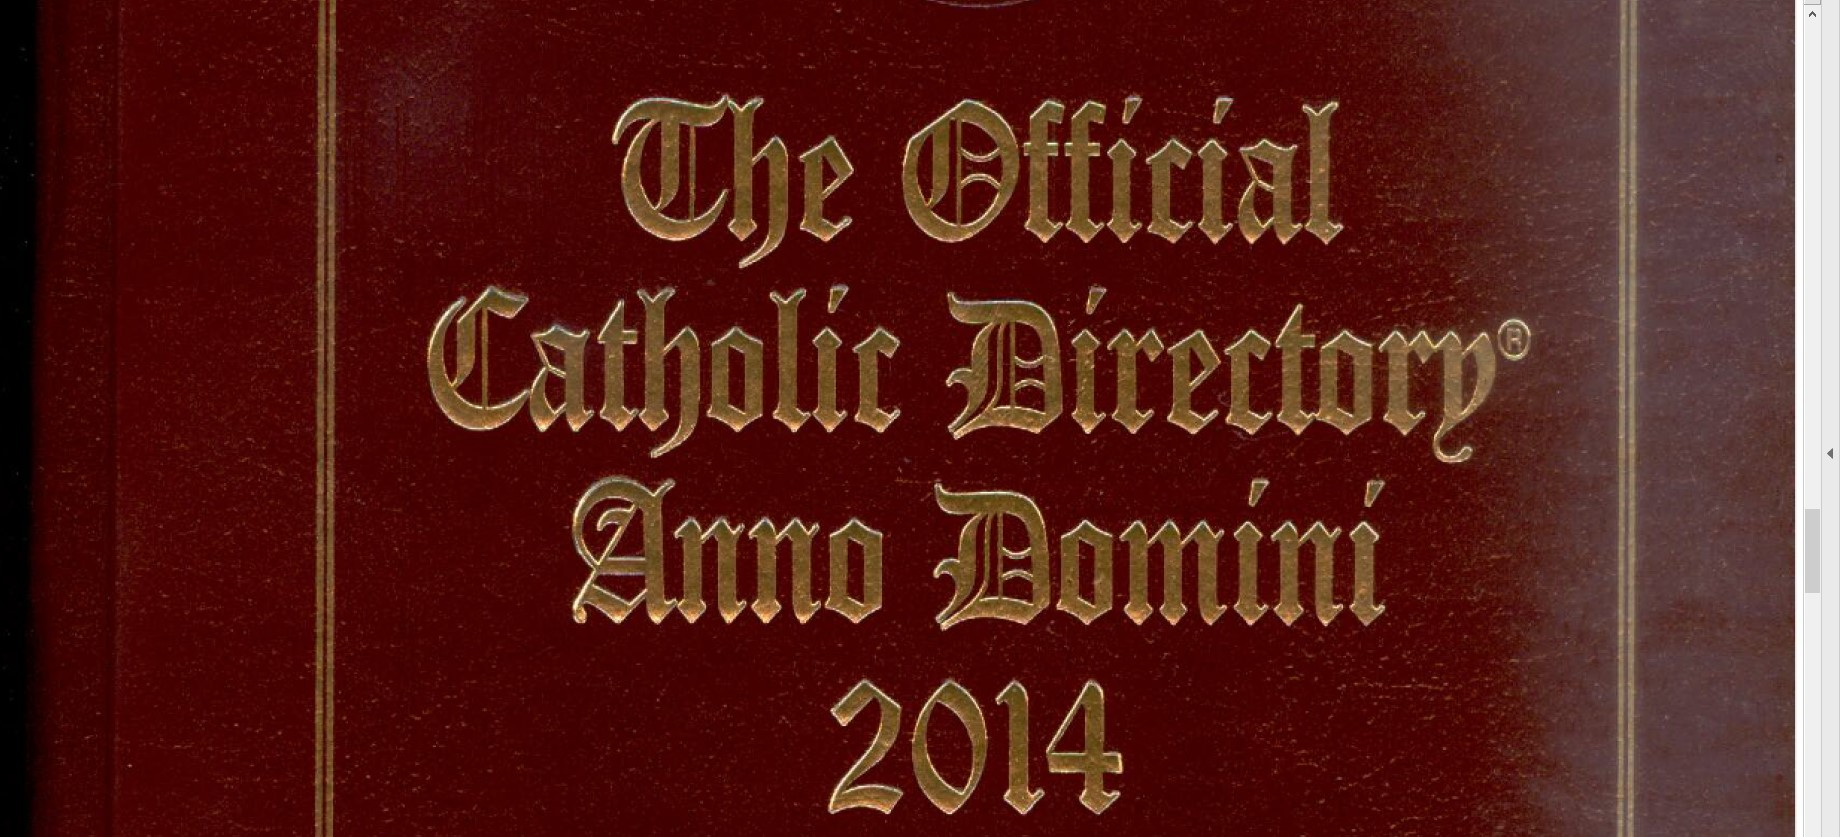 Catholic foundation's Form 990 exemption suggests lack of oversight